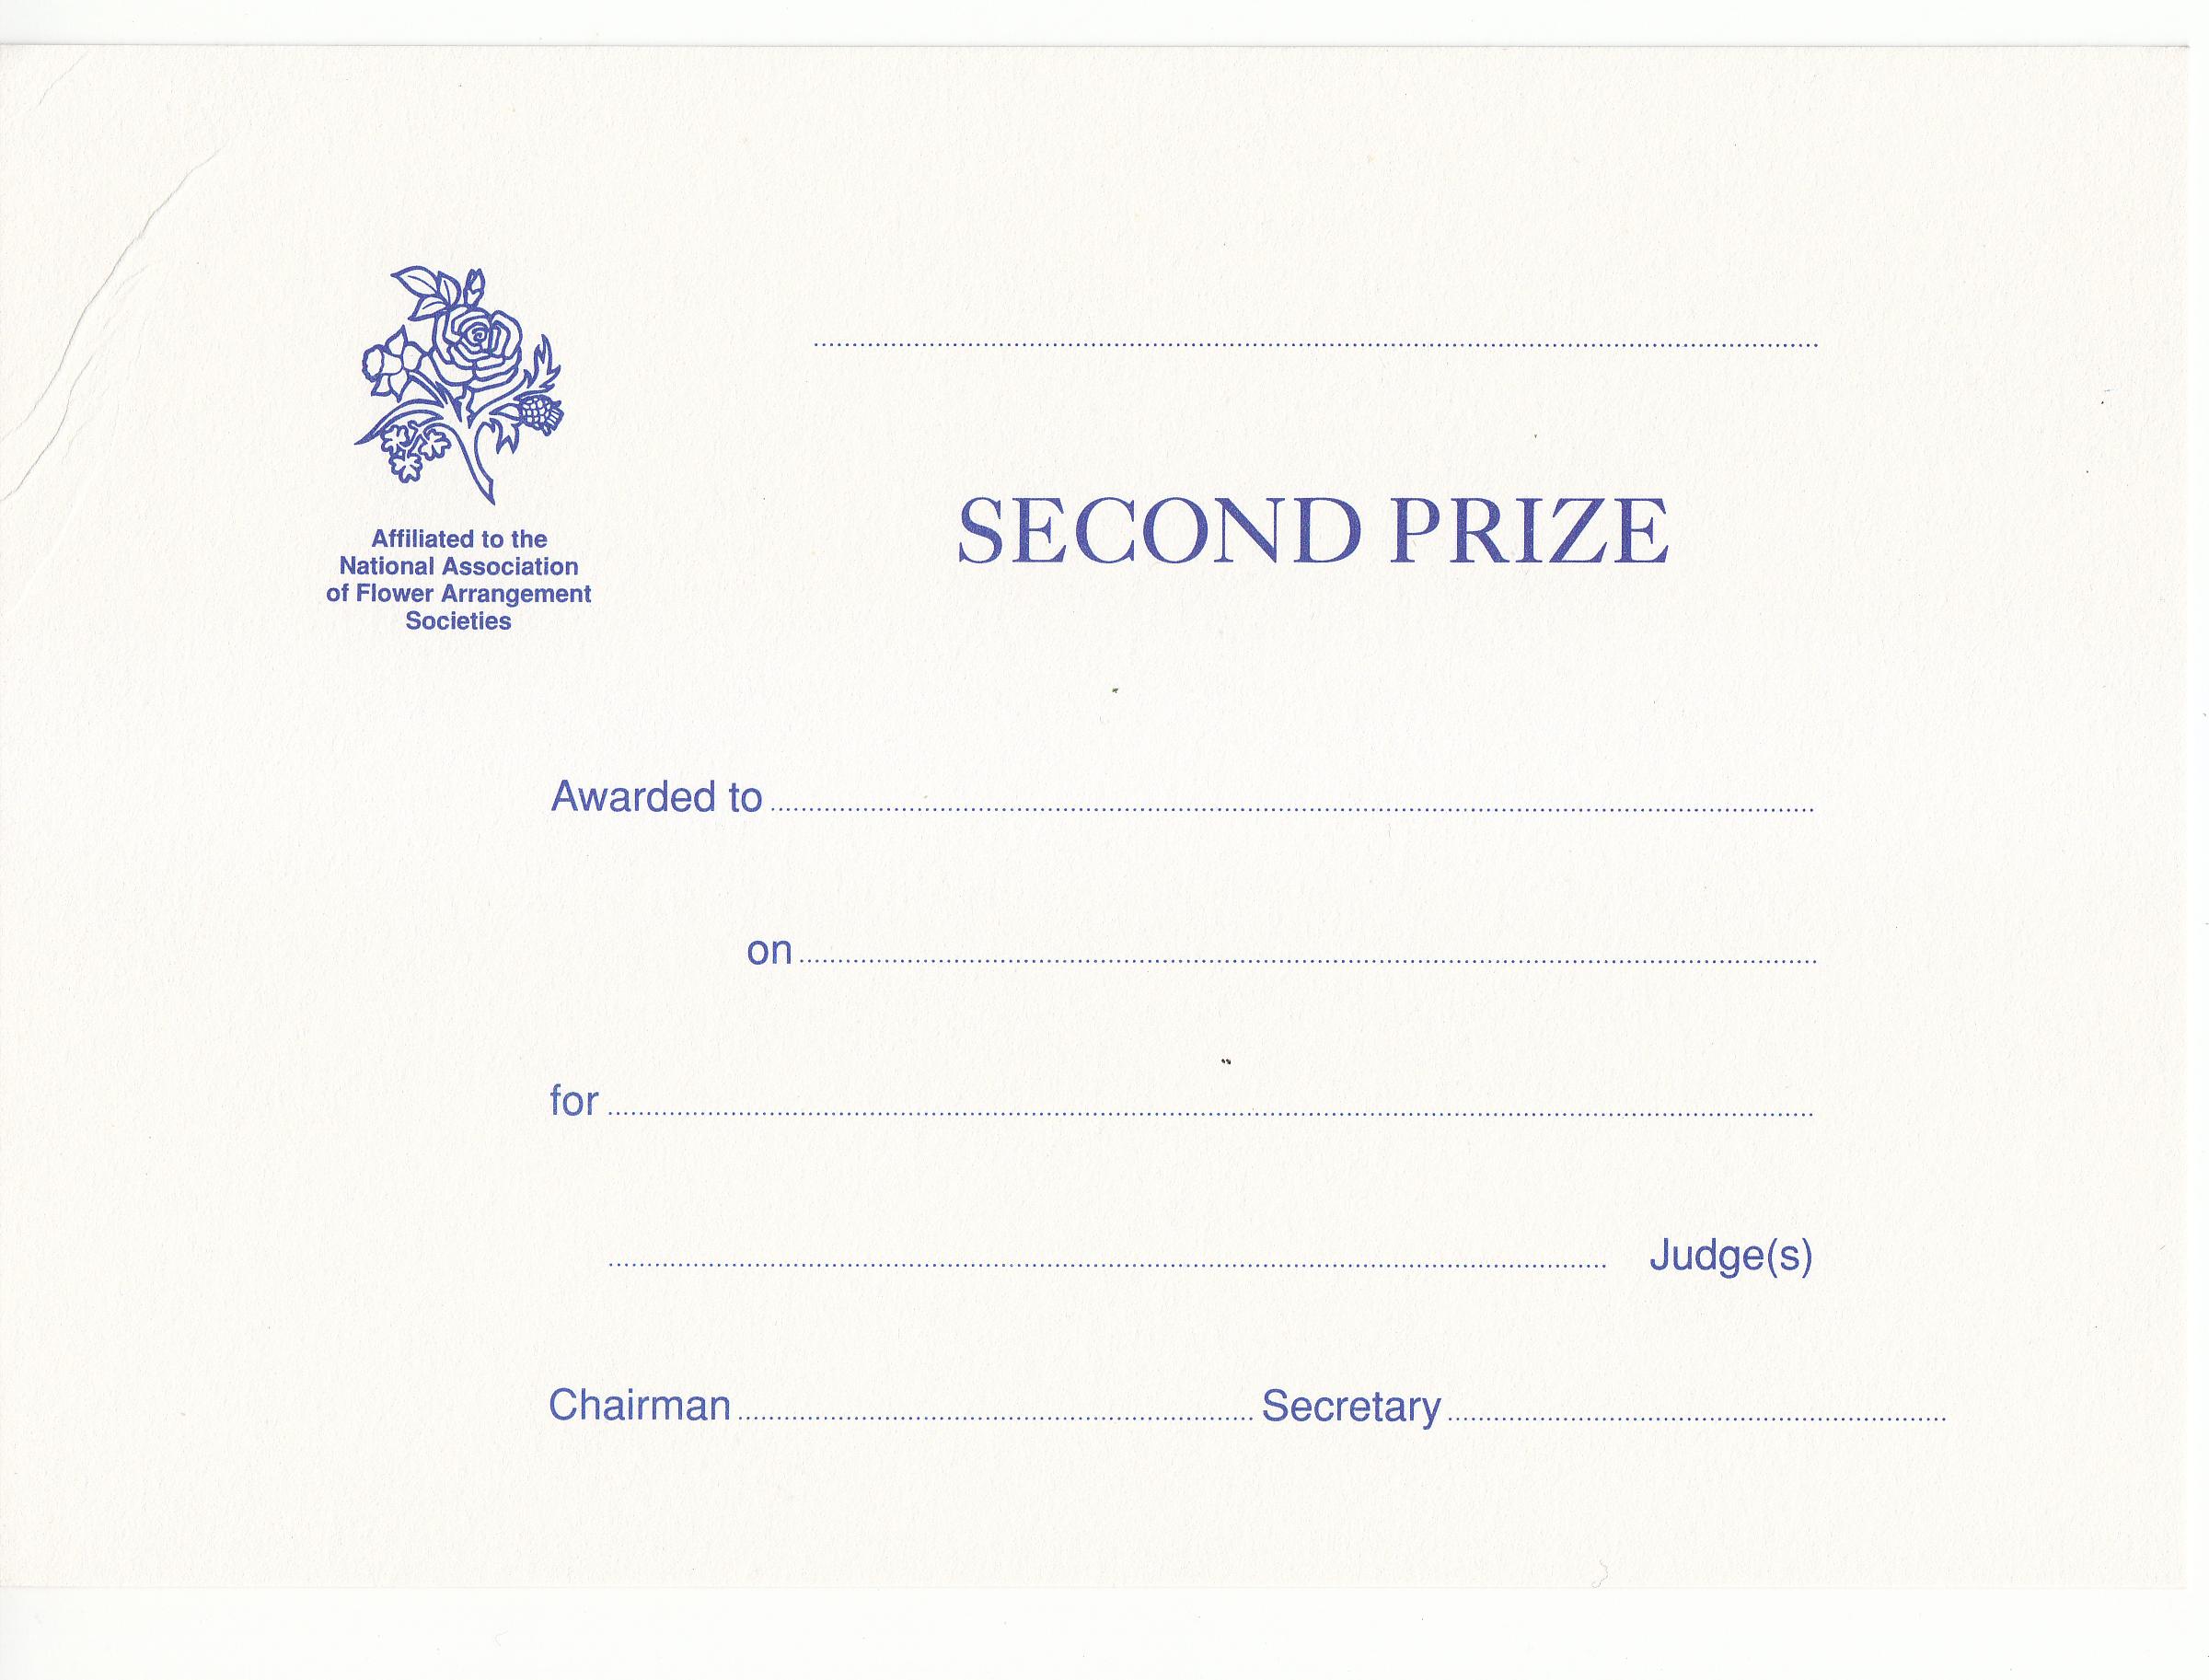 EAW003 2nd Prize Award